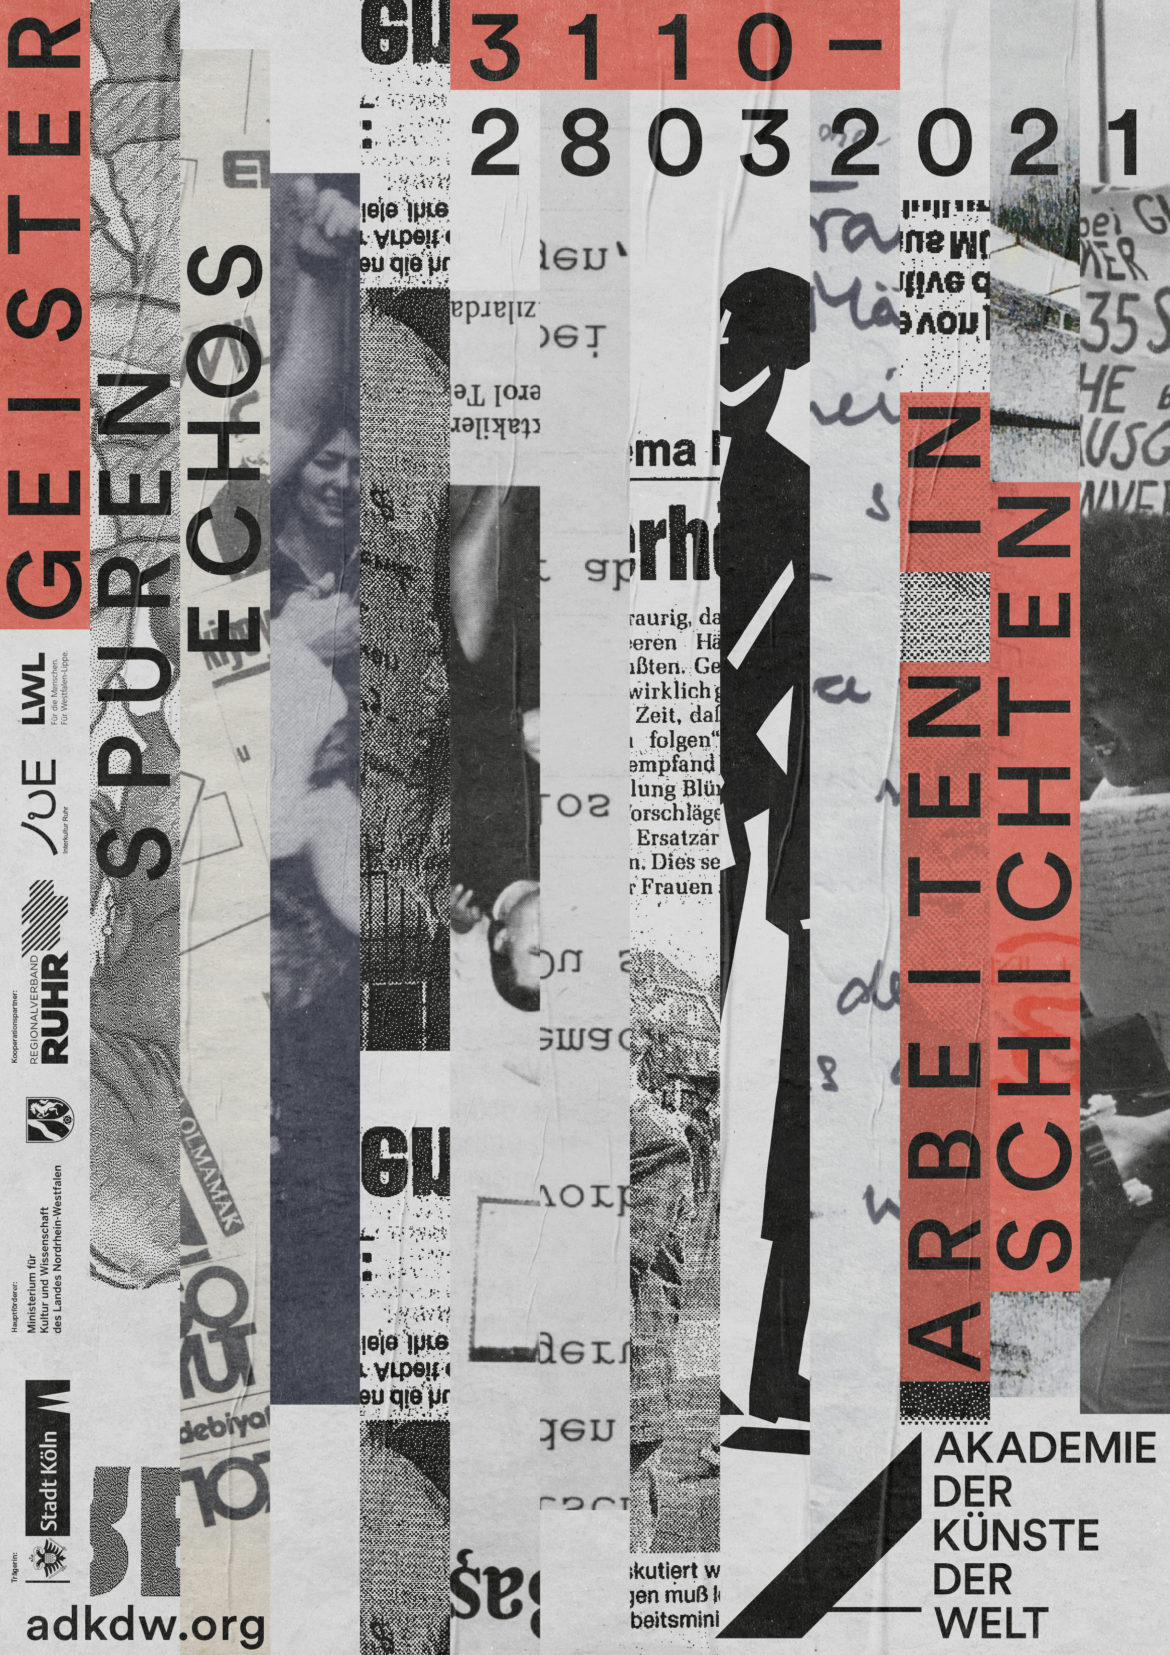 Plakat |Geister | Strasse |Köln